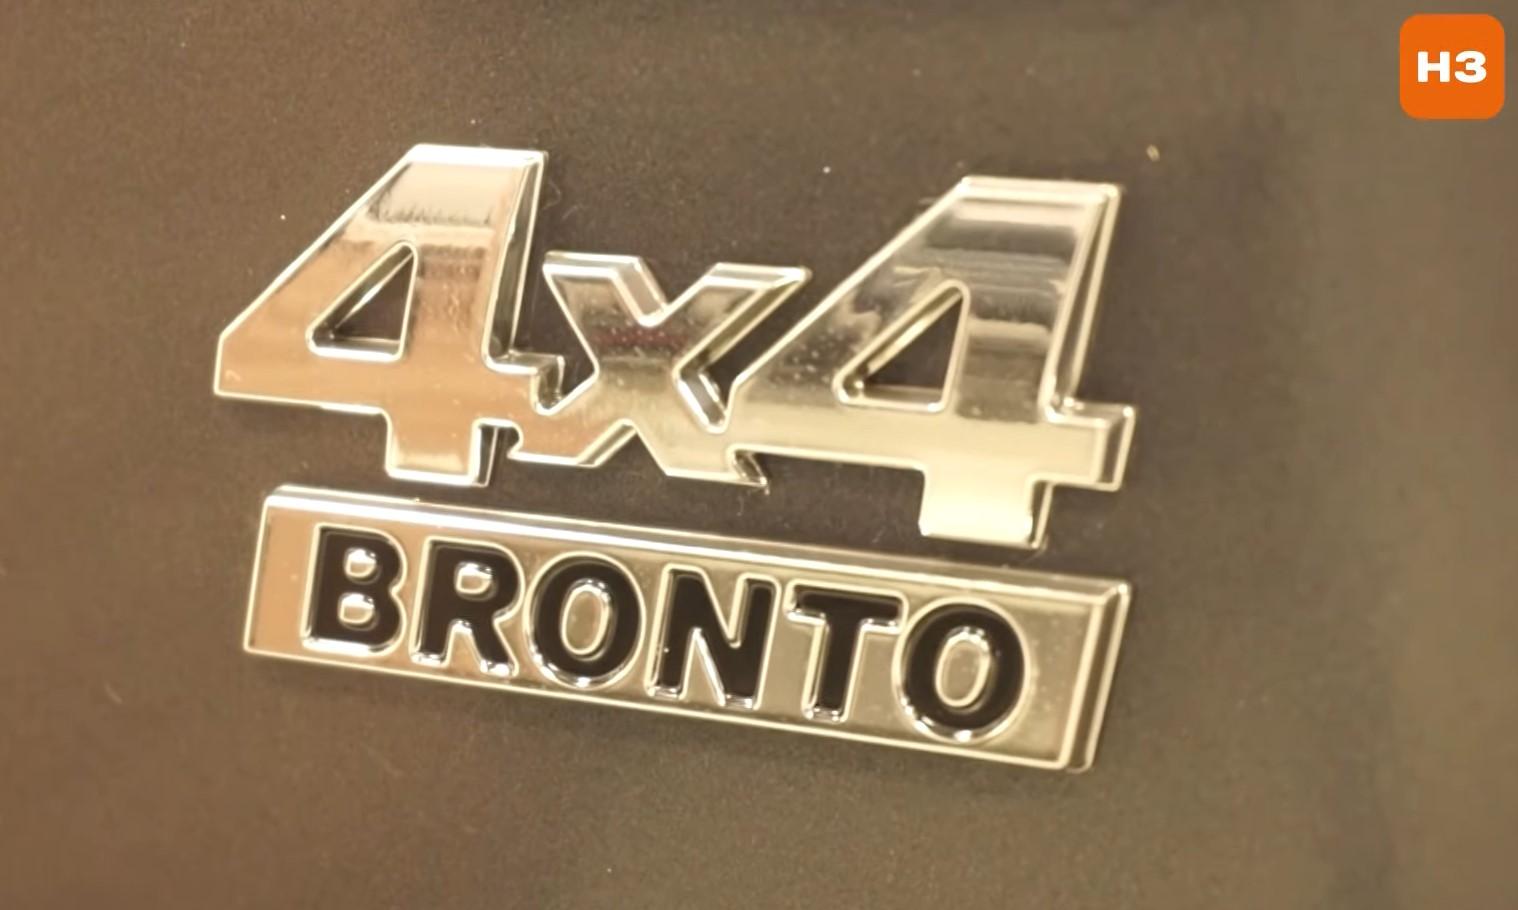 LADA 4x4 Bronto может вернуться в автосалоны через месяц